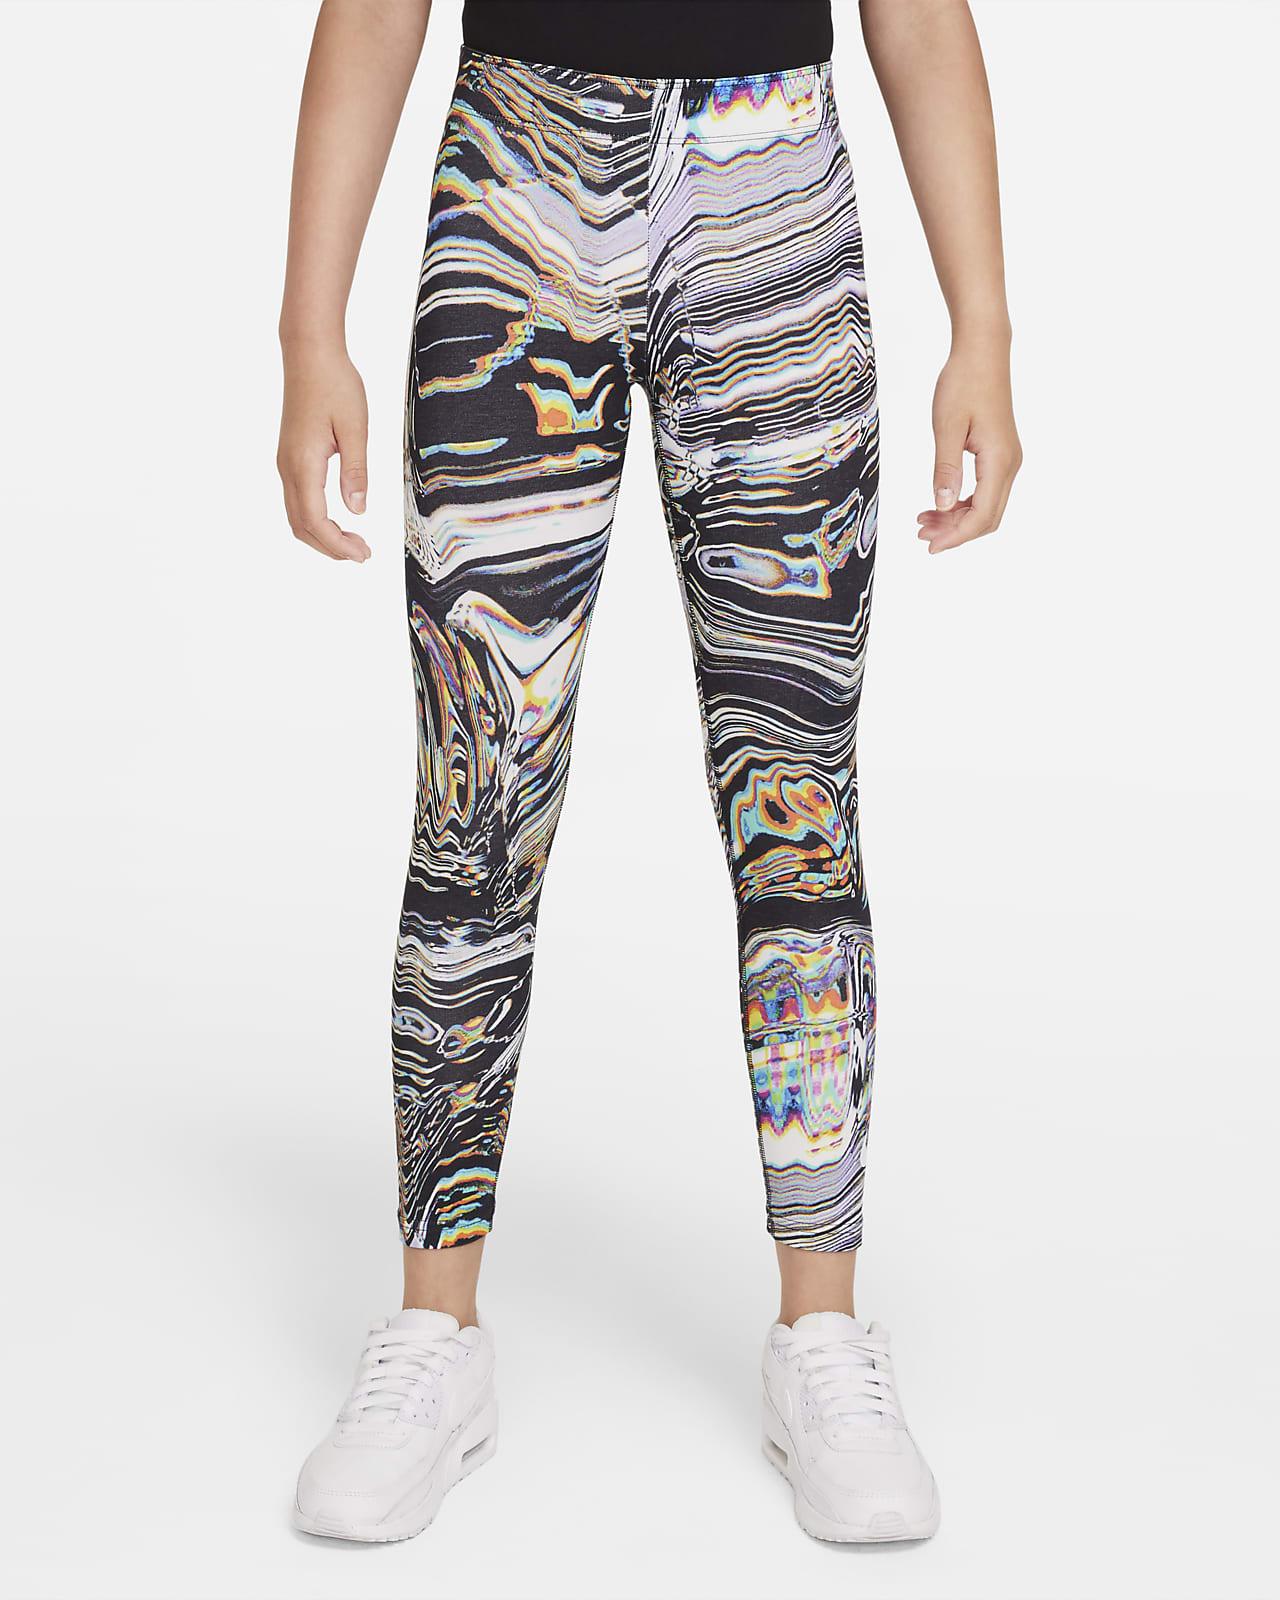 Nike Sportswear Favourites Older Kids' (Girls') Printed Dance Leggings